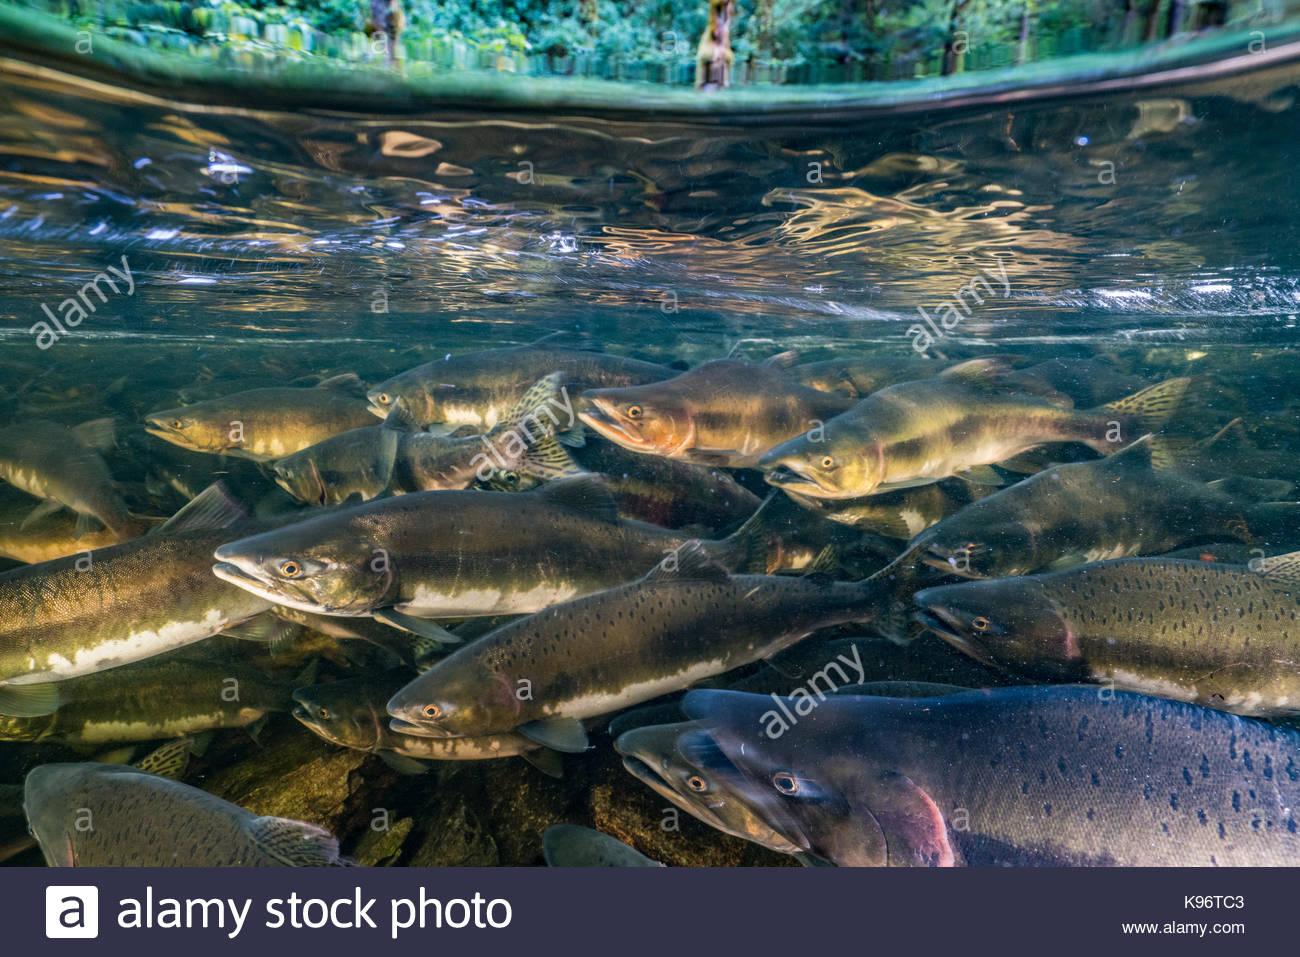 School of chinook salmon swim upstream to compete for spawning ground. - Stock Image